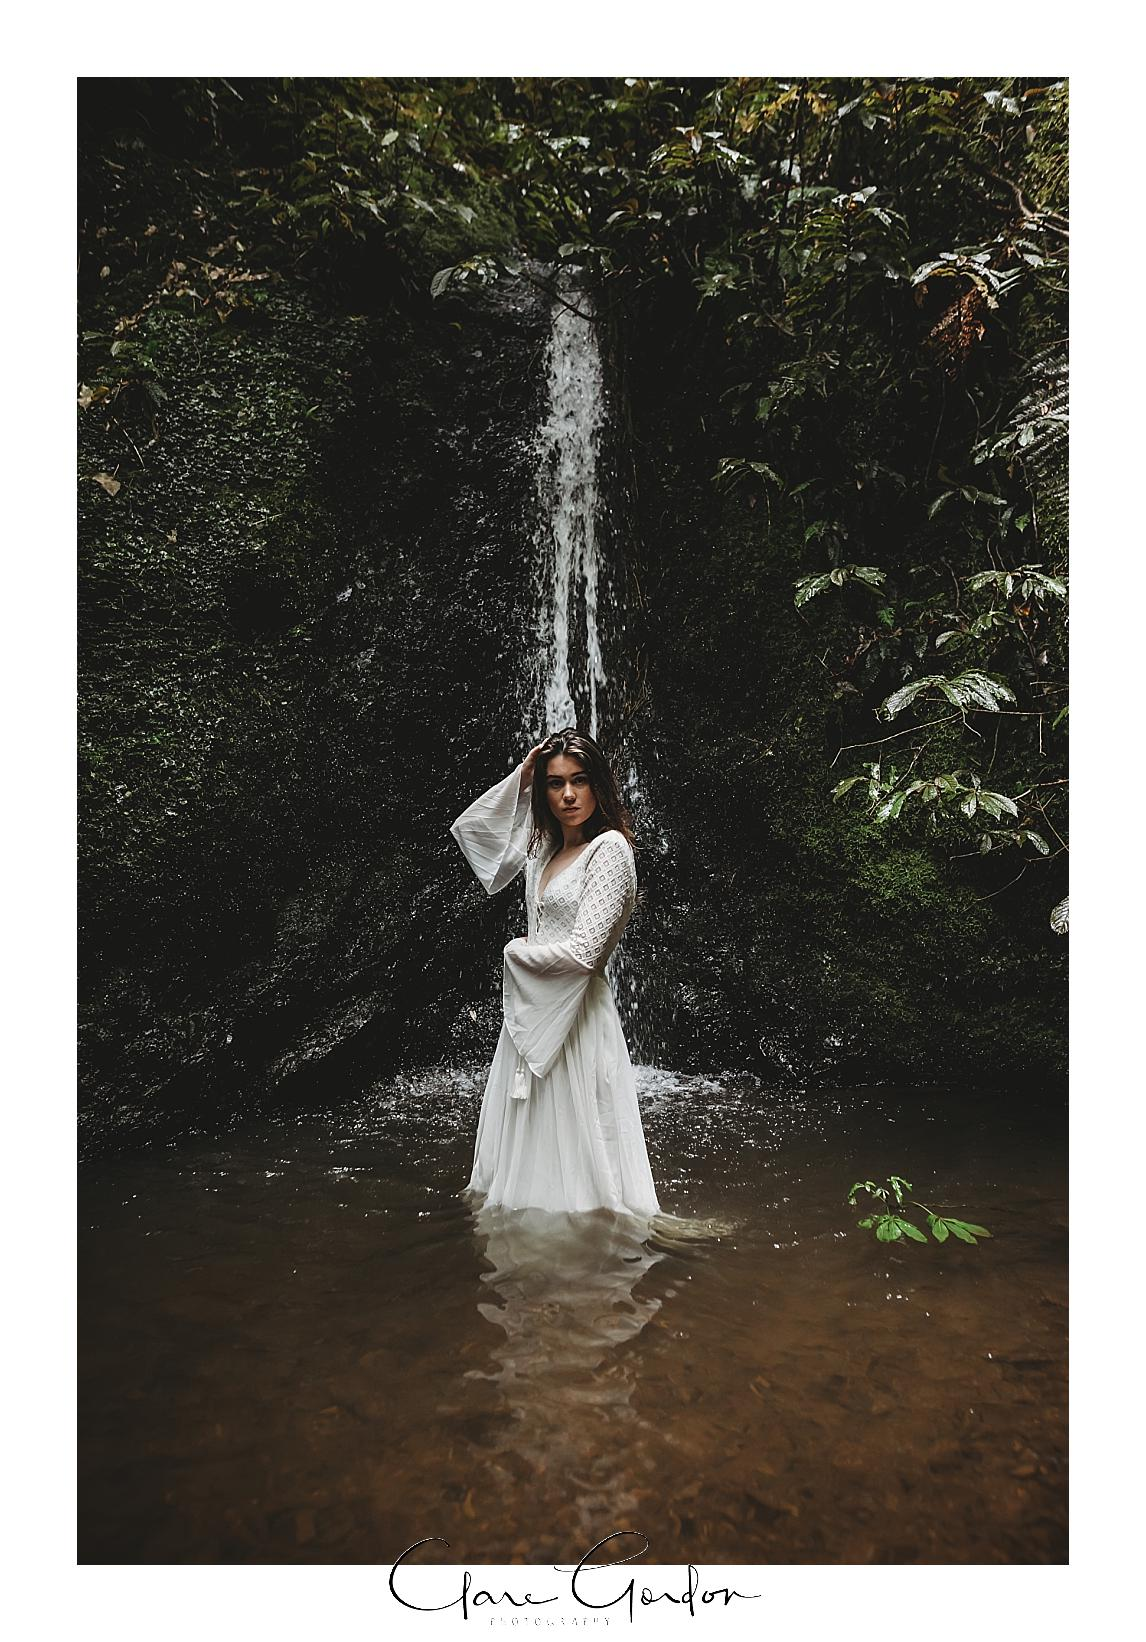 boho-bride-Shoot-Waikato-Wedding-photography-Girl-in Waterfall -New Zealand-wedding (12).jpg